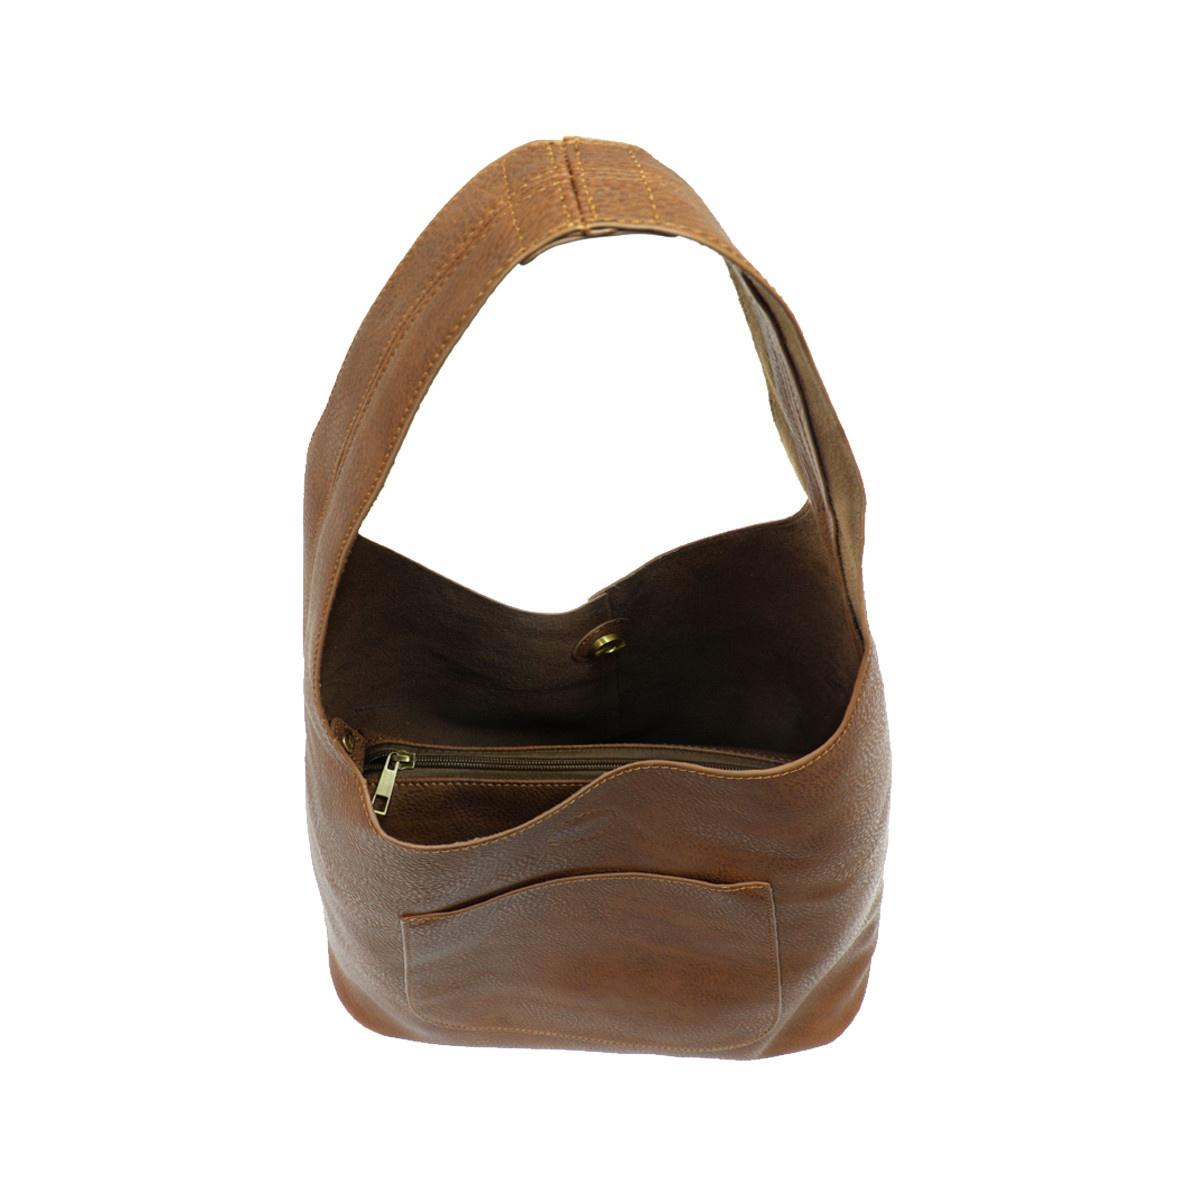 Joy Susan Joy Susan Molly Slouchy Hobo Handbag Hickory